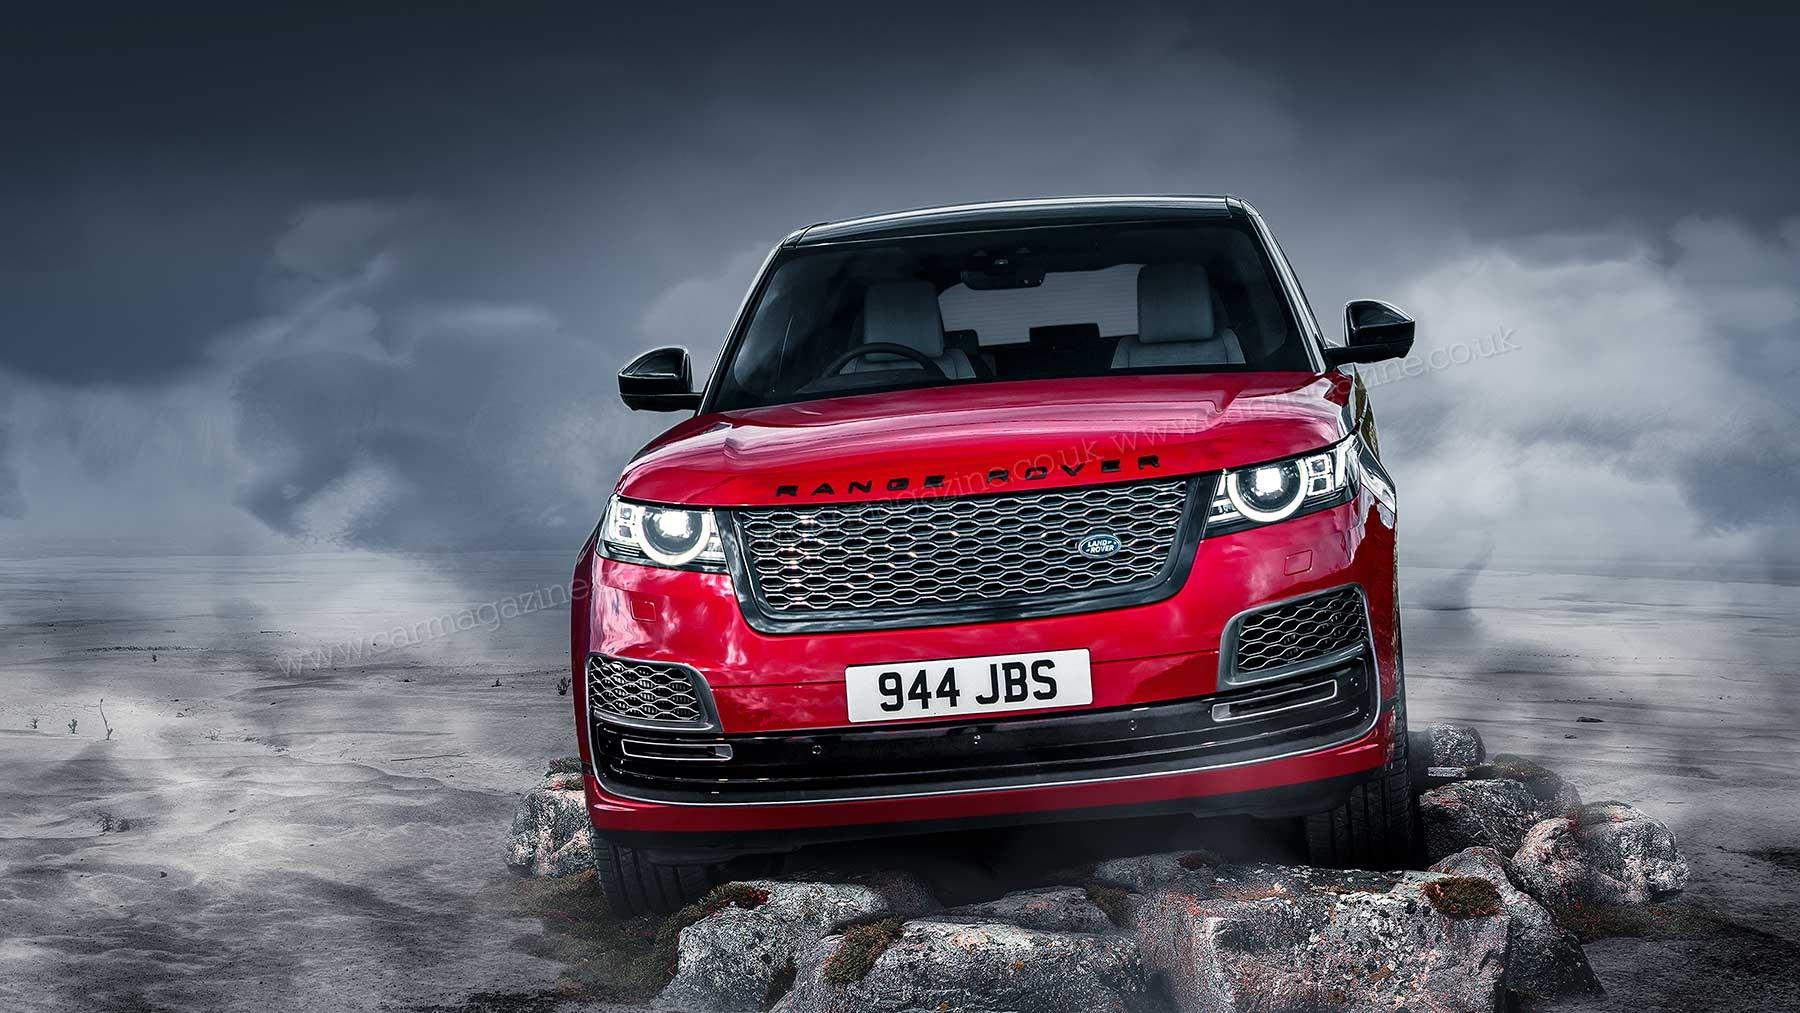 New 2021 Range Rover Mk5 The Luxury Suv Goes Testing Car Magazine